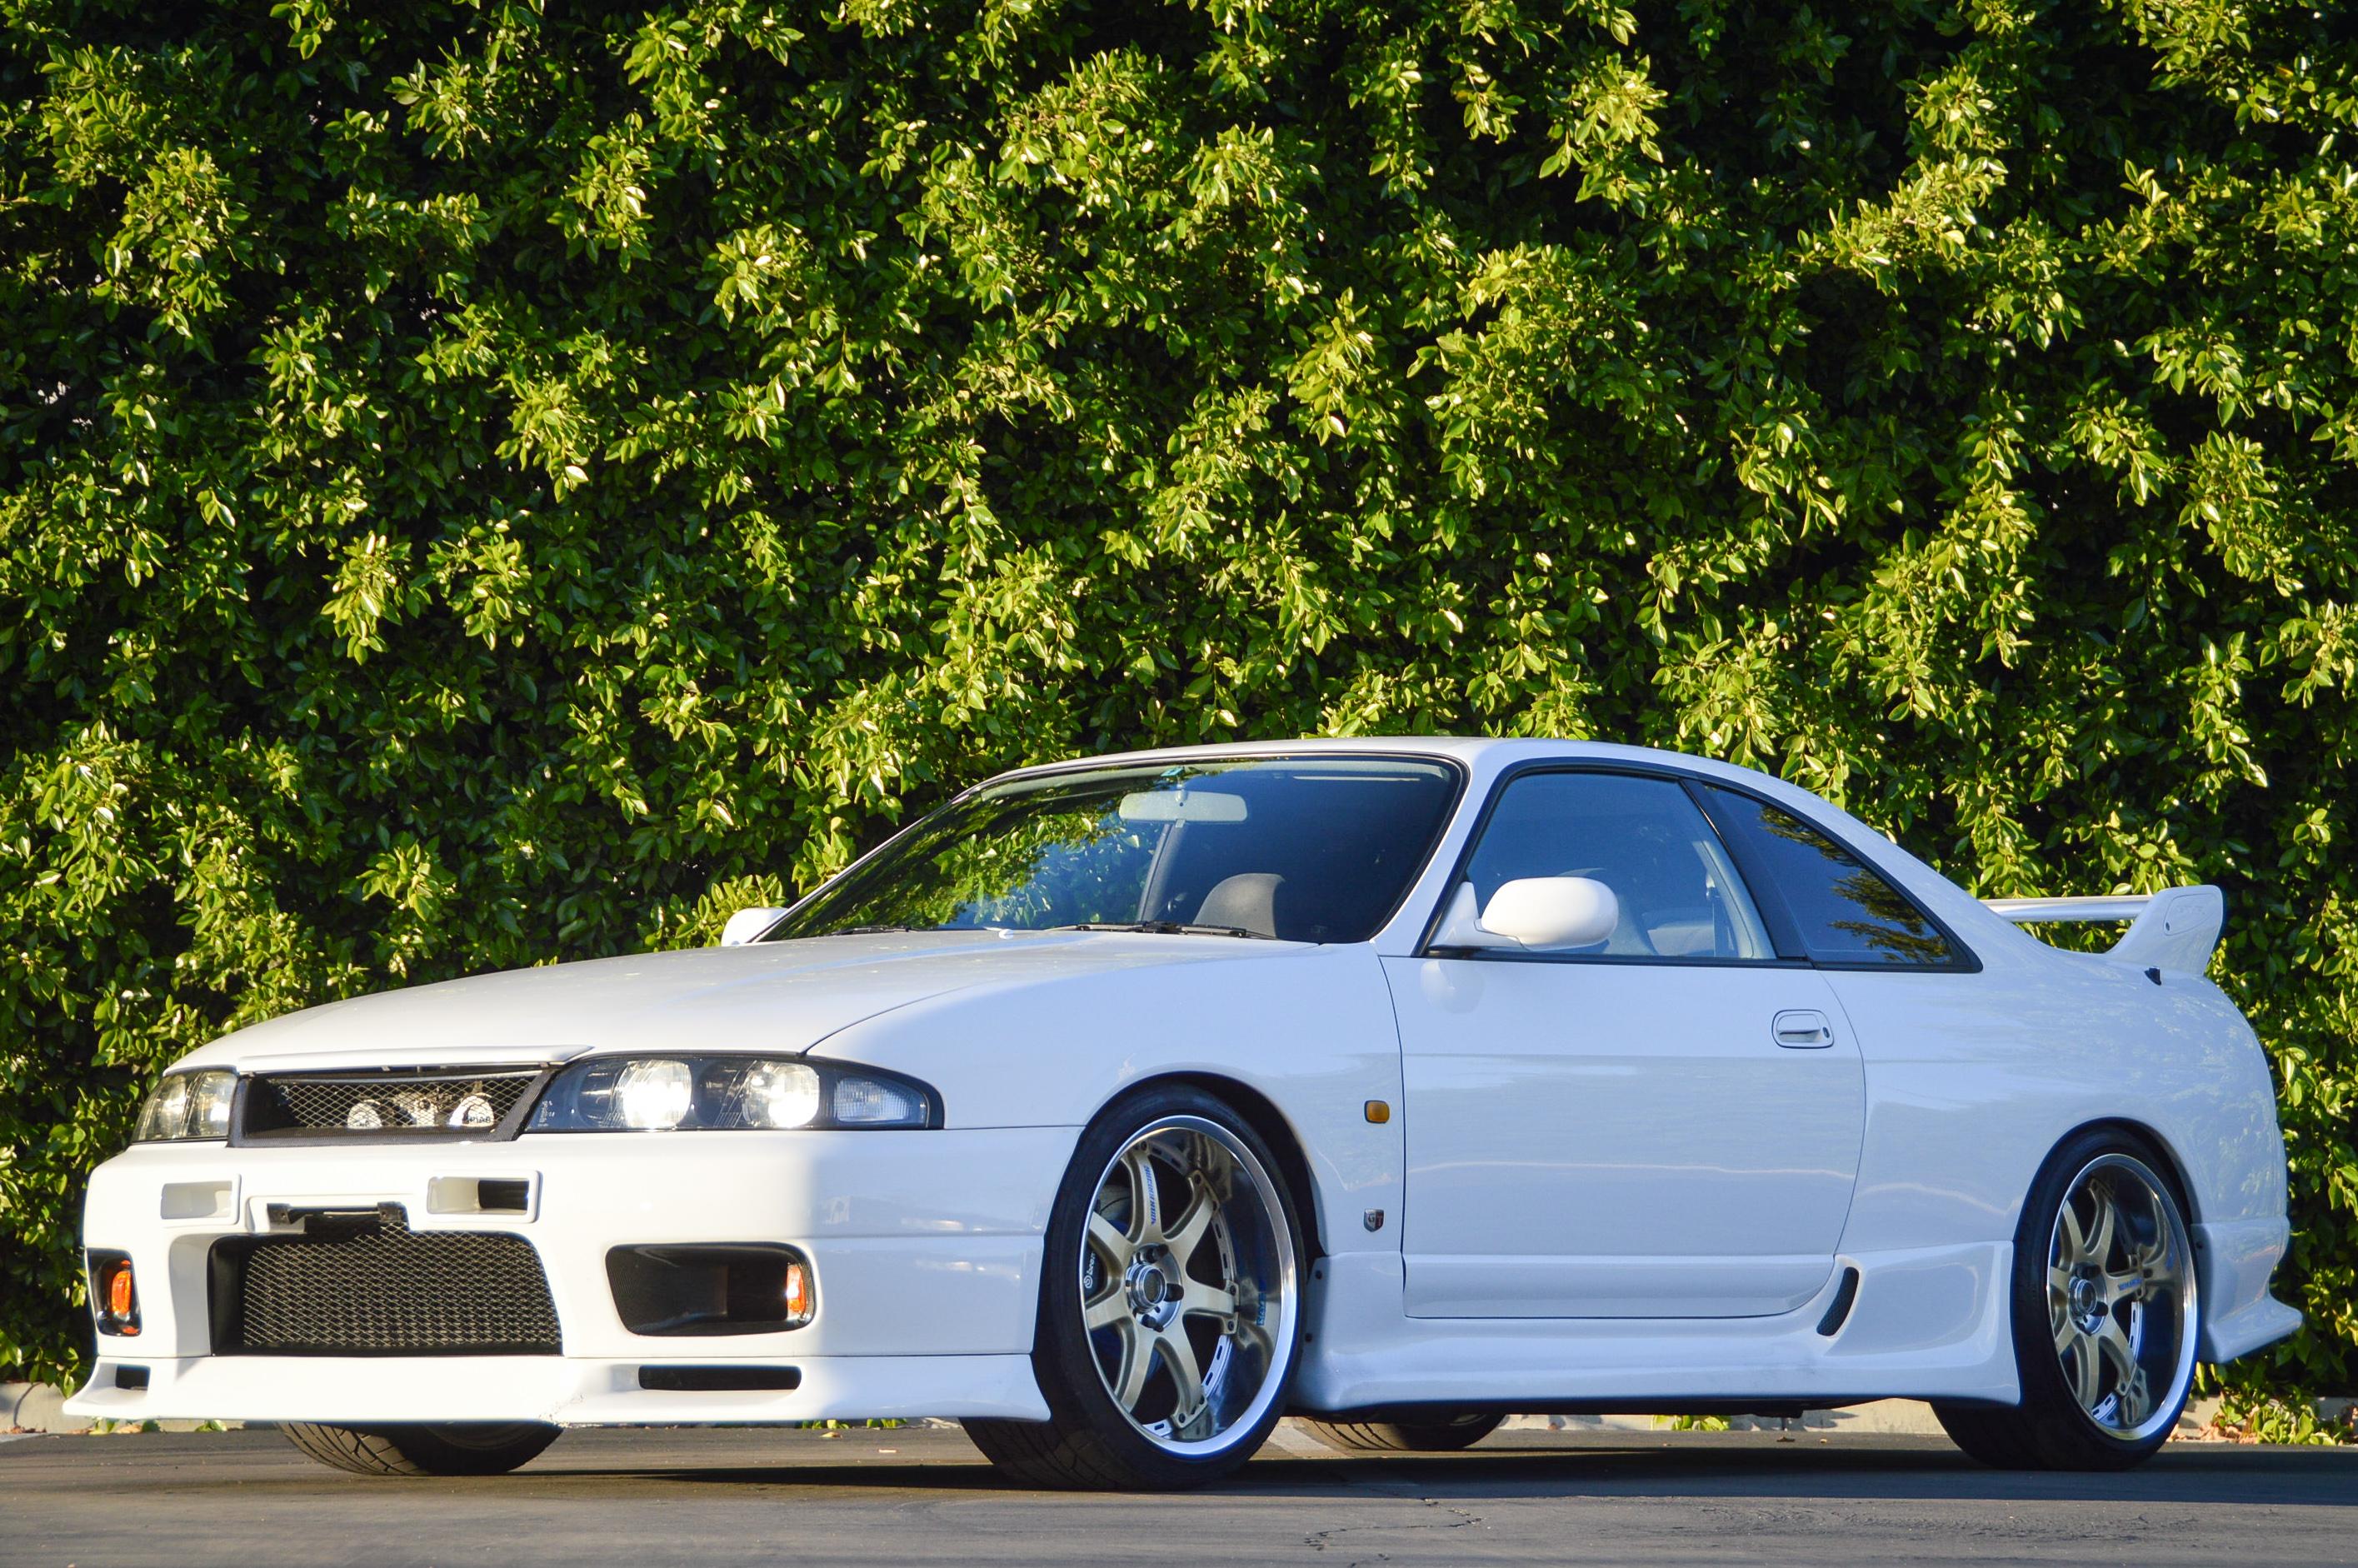 R33 Nissan Skyline GT-R for sale by Toprank Importers